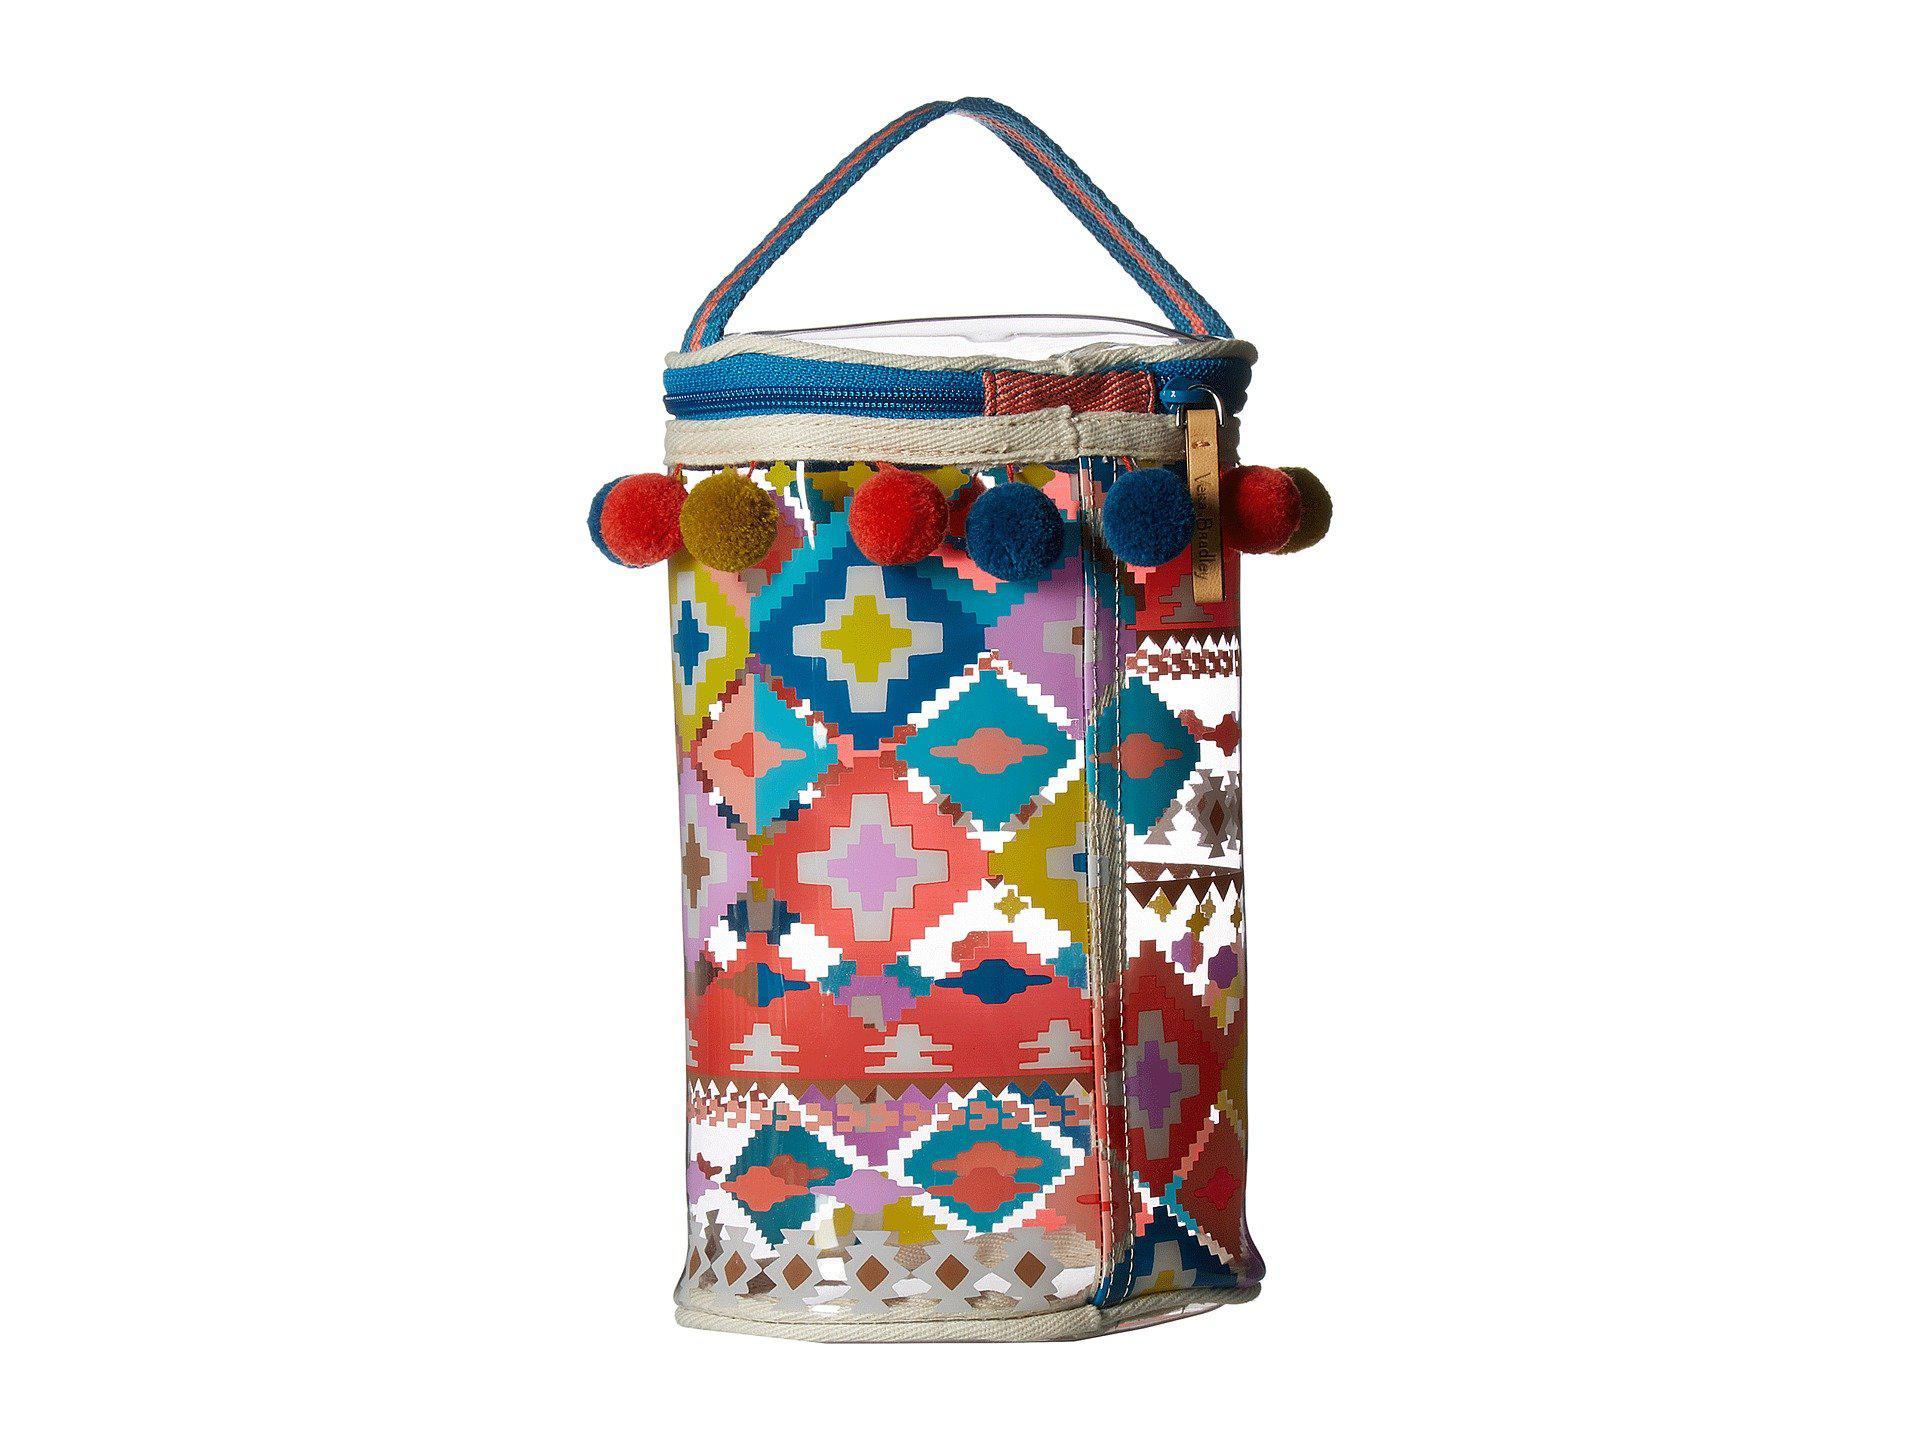 Vera Bradley Blue Lotion Bag Lyst View Fullscreen